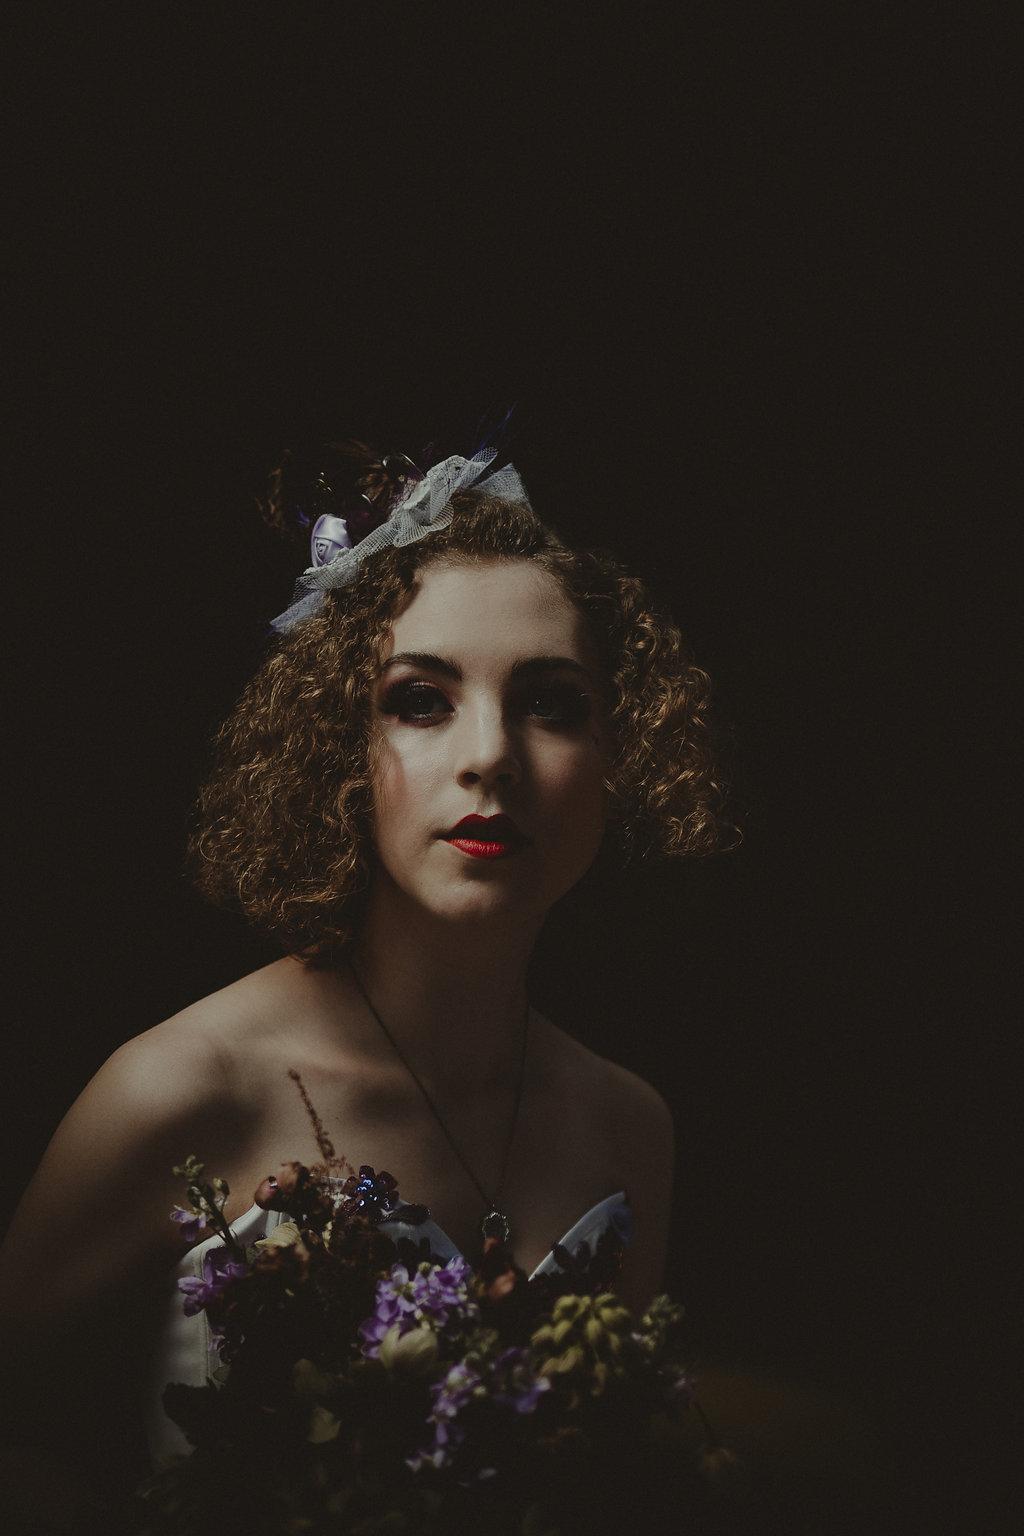 Studio Fotografico Bacci - Steampunk wedding - alternative wedding 23